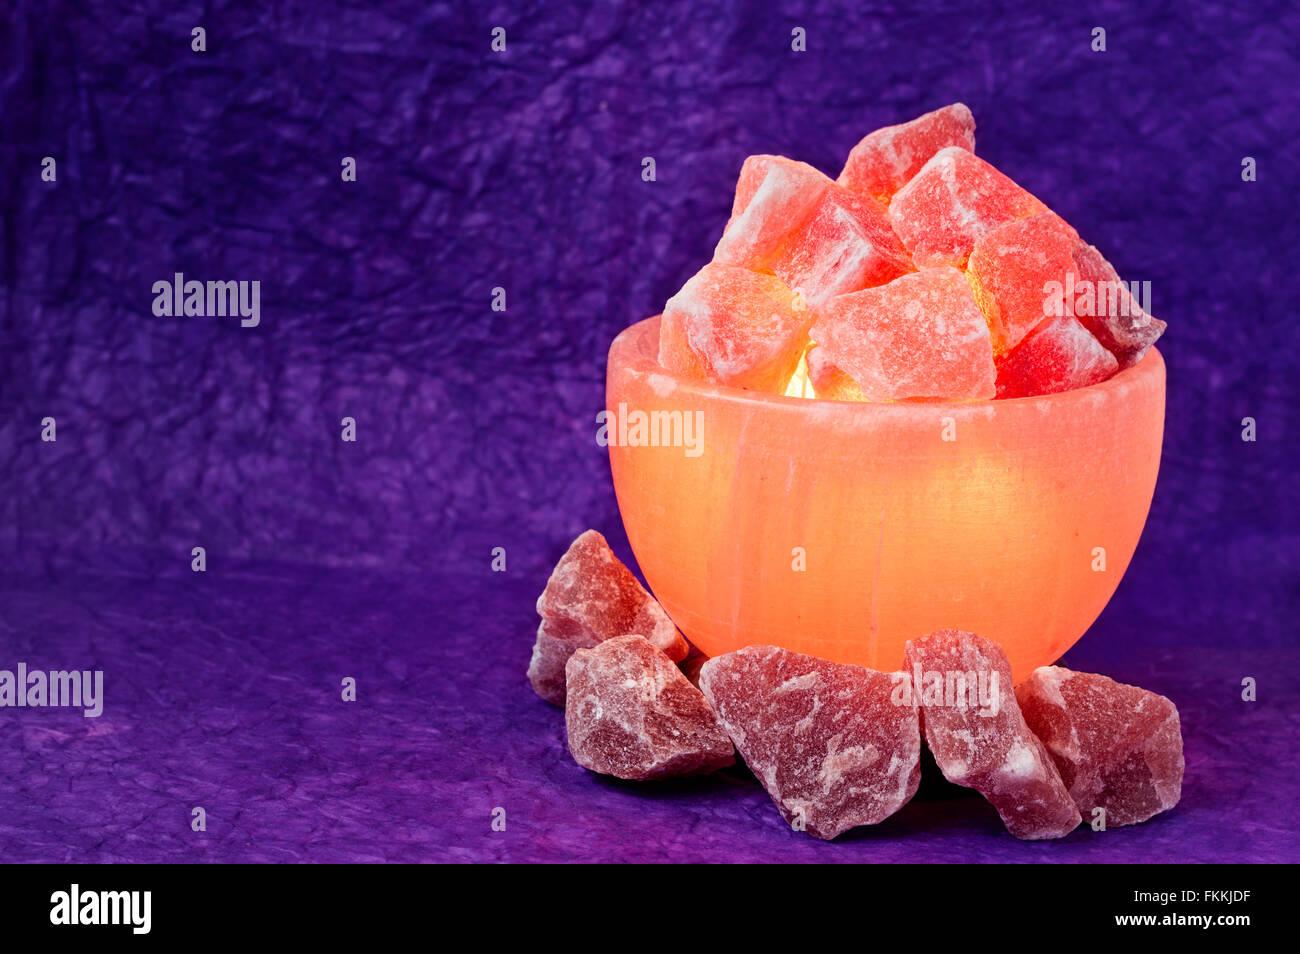 http://c8.alamy.com/comp/FKKJDF/turned-on-himalayan-pink-salt-lamp-carved-as-a-bowl-with-a-wrinkled-FKKJDF.jpg